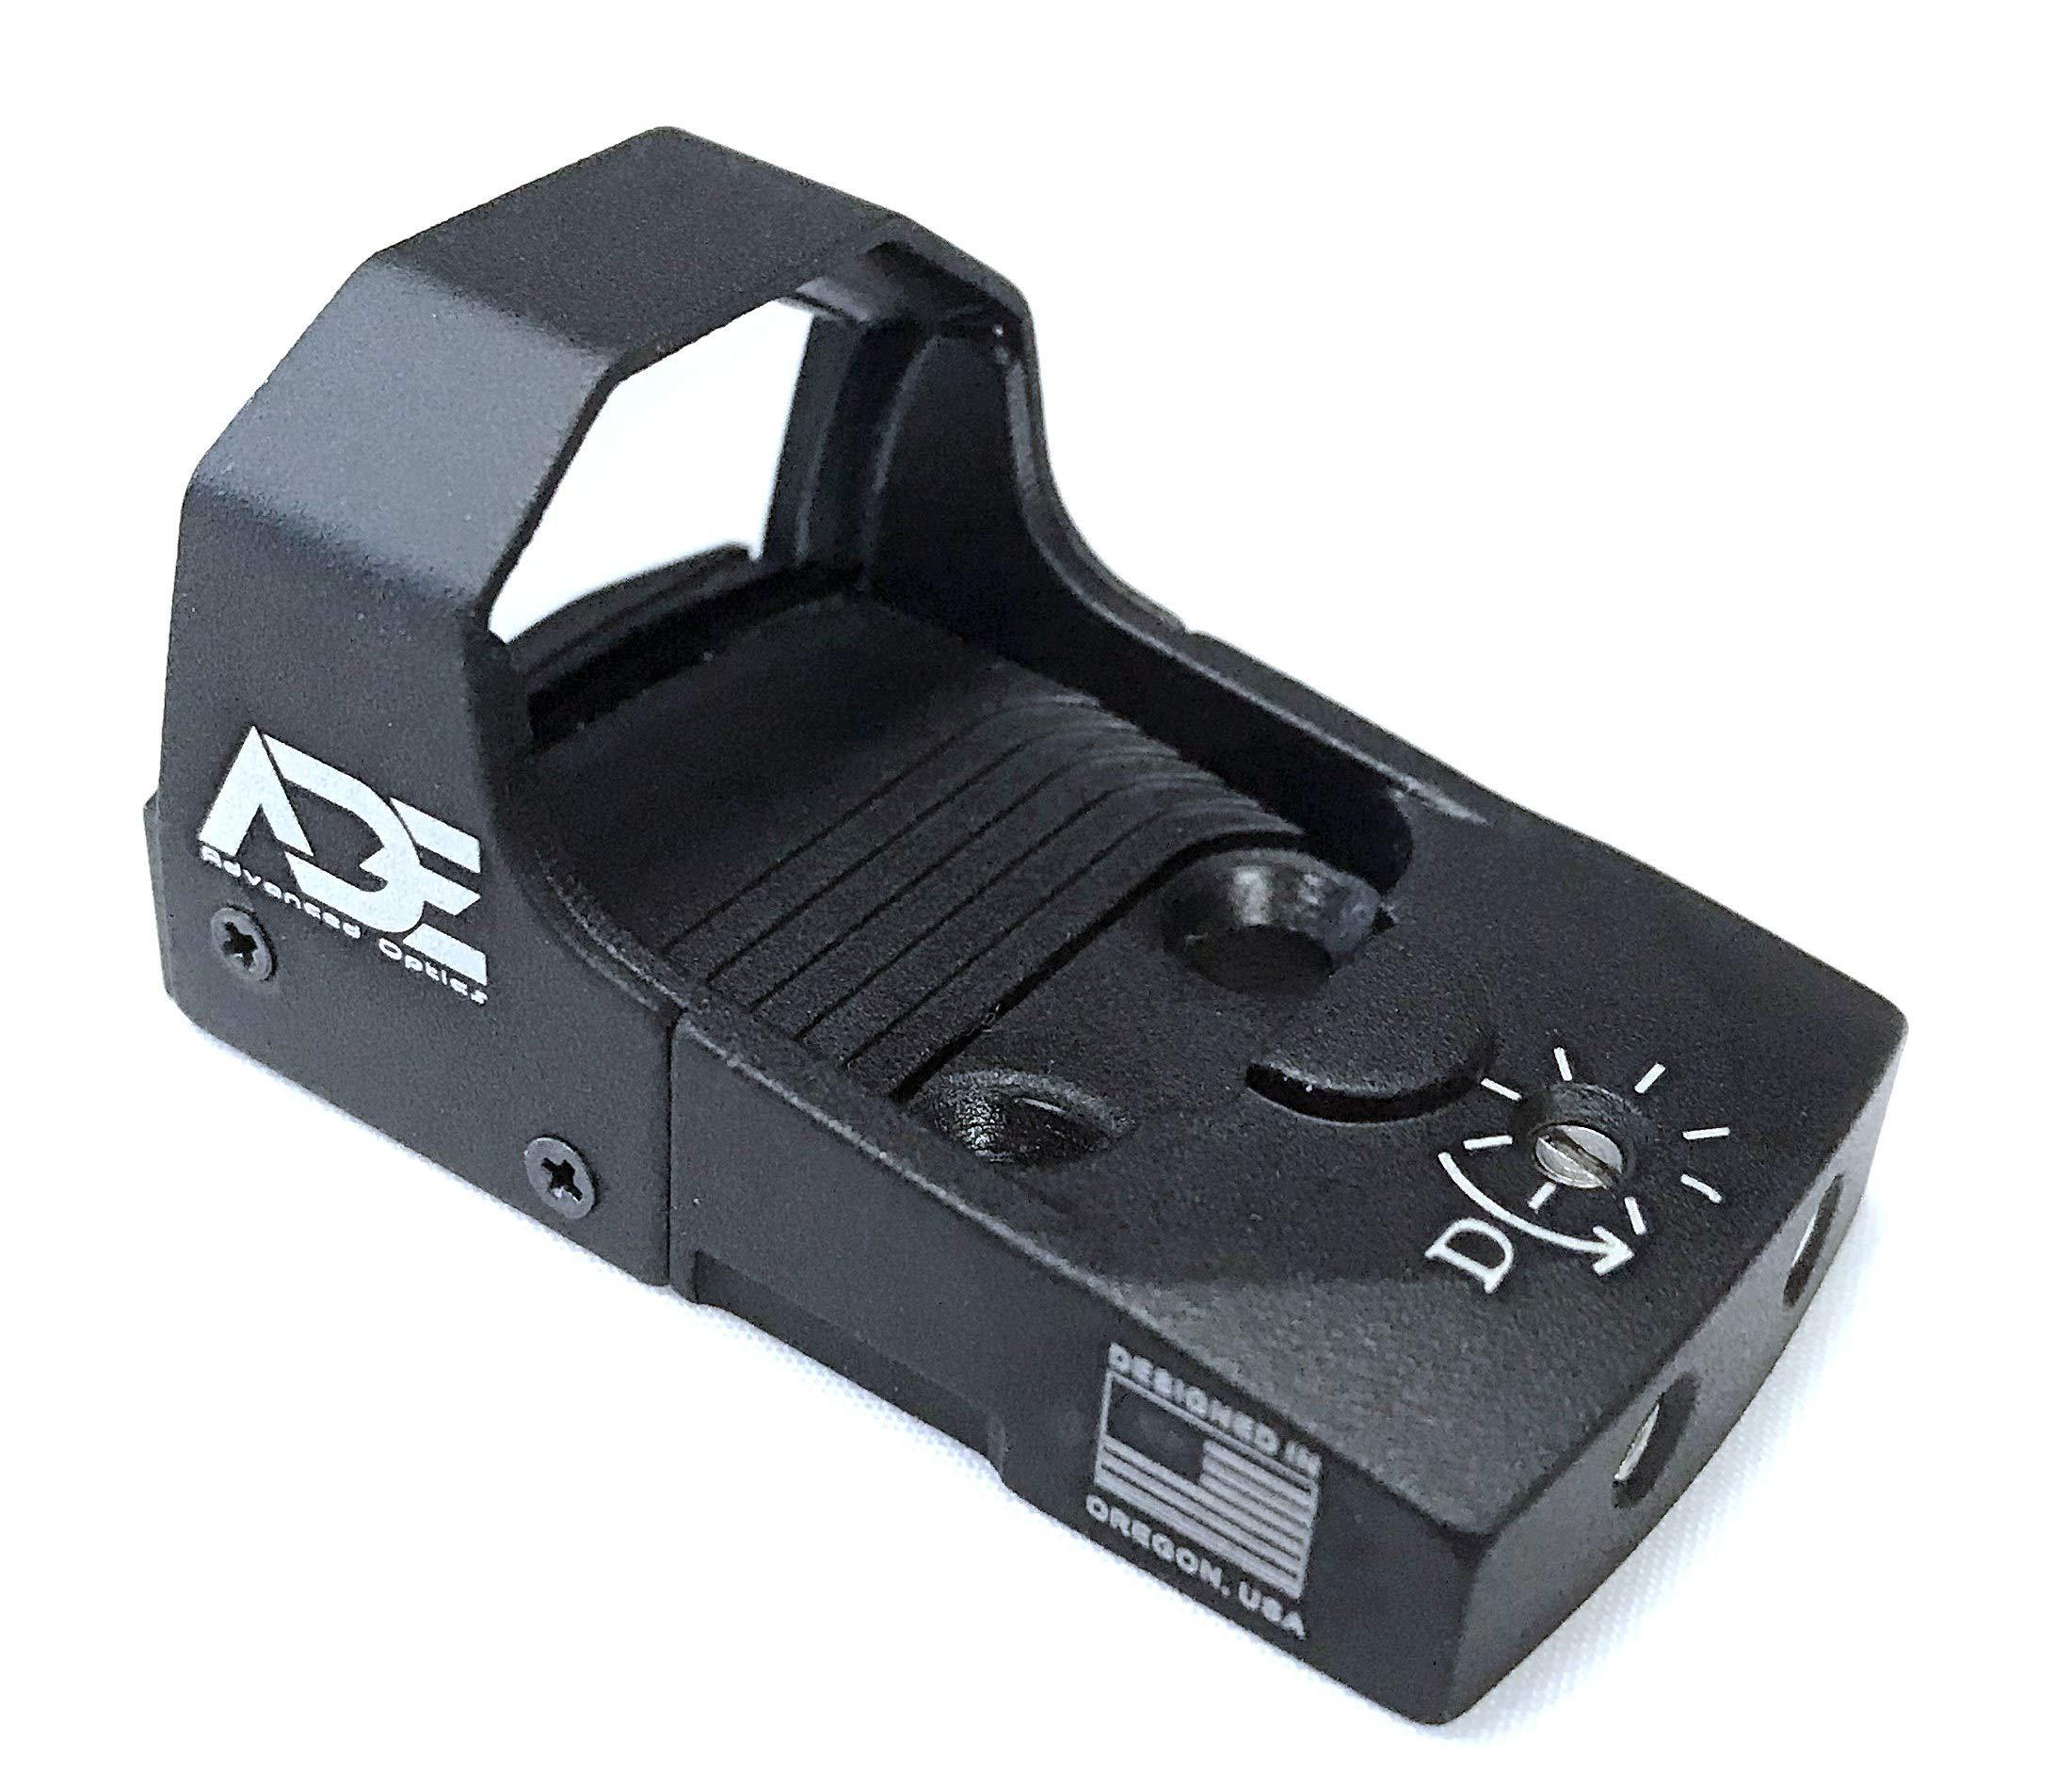 Ade Advanced Optics Mini RD3-006x Green Dot Reflex Sight for HK USP Pistol Mounting Plate That Replace Rear Sight by Ade Advanced Optics